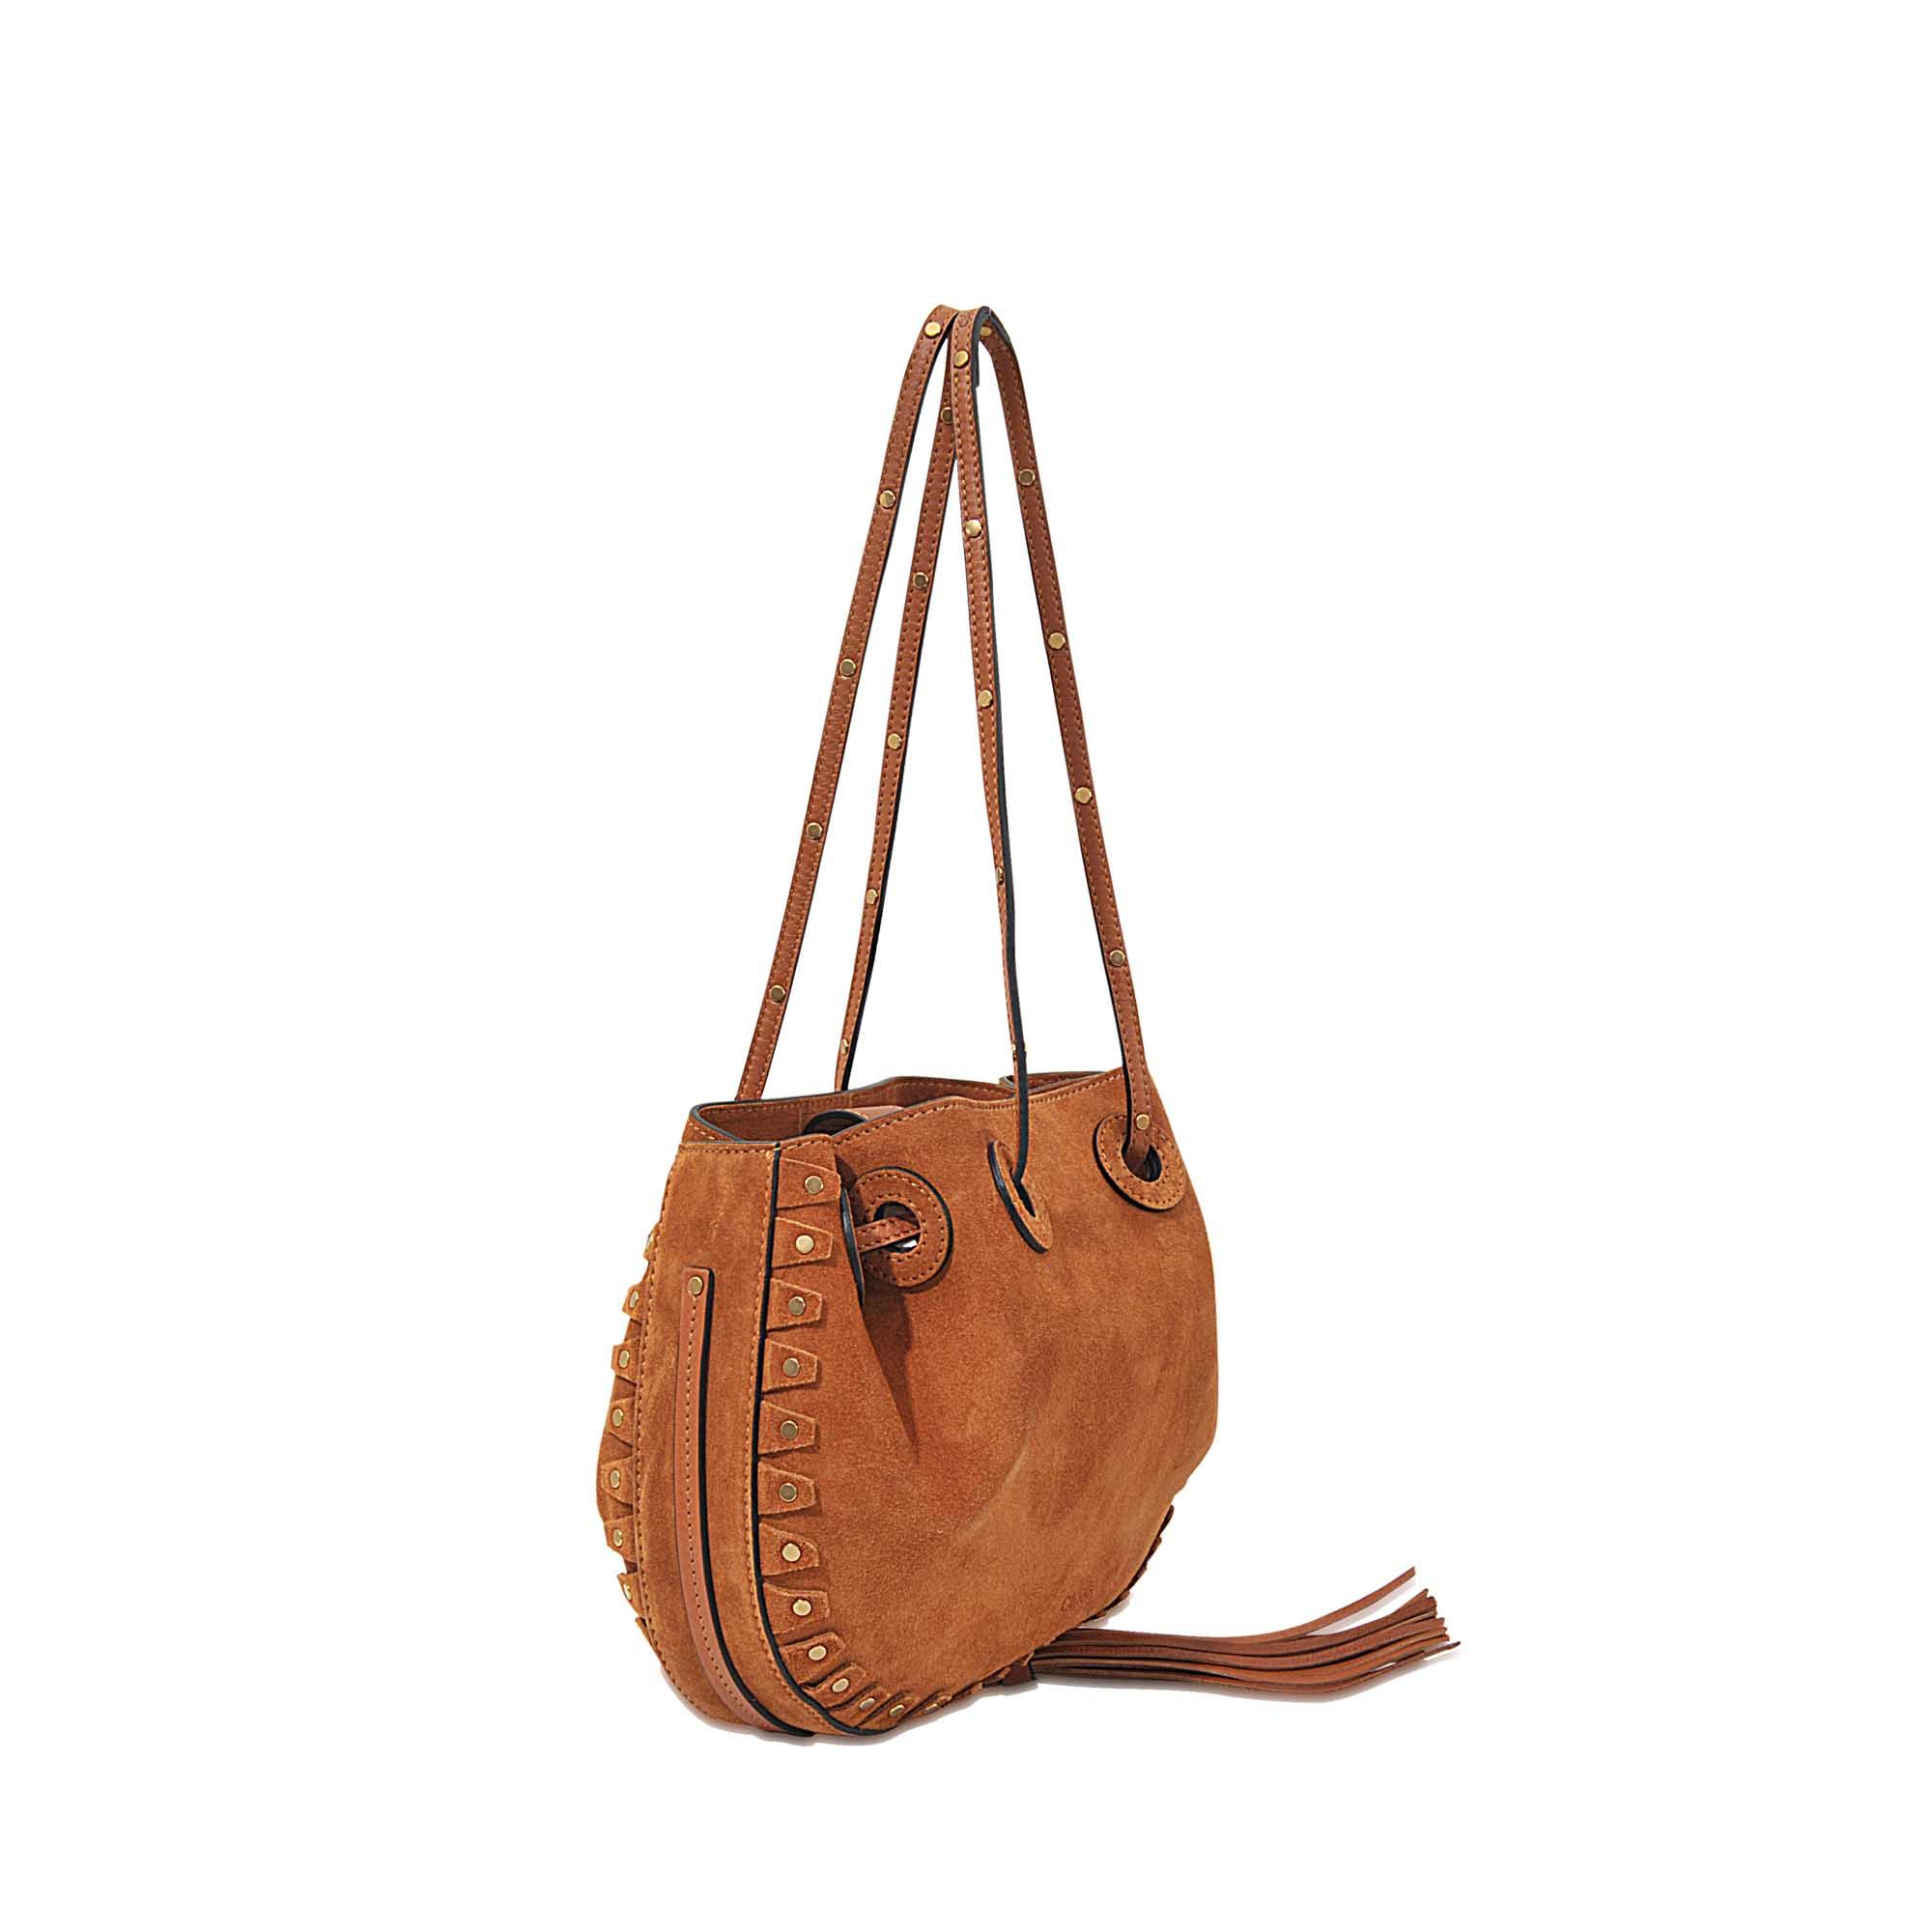 338aba548534 Chloé Inez Small Drawstring Bag in Brown - Lyst